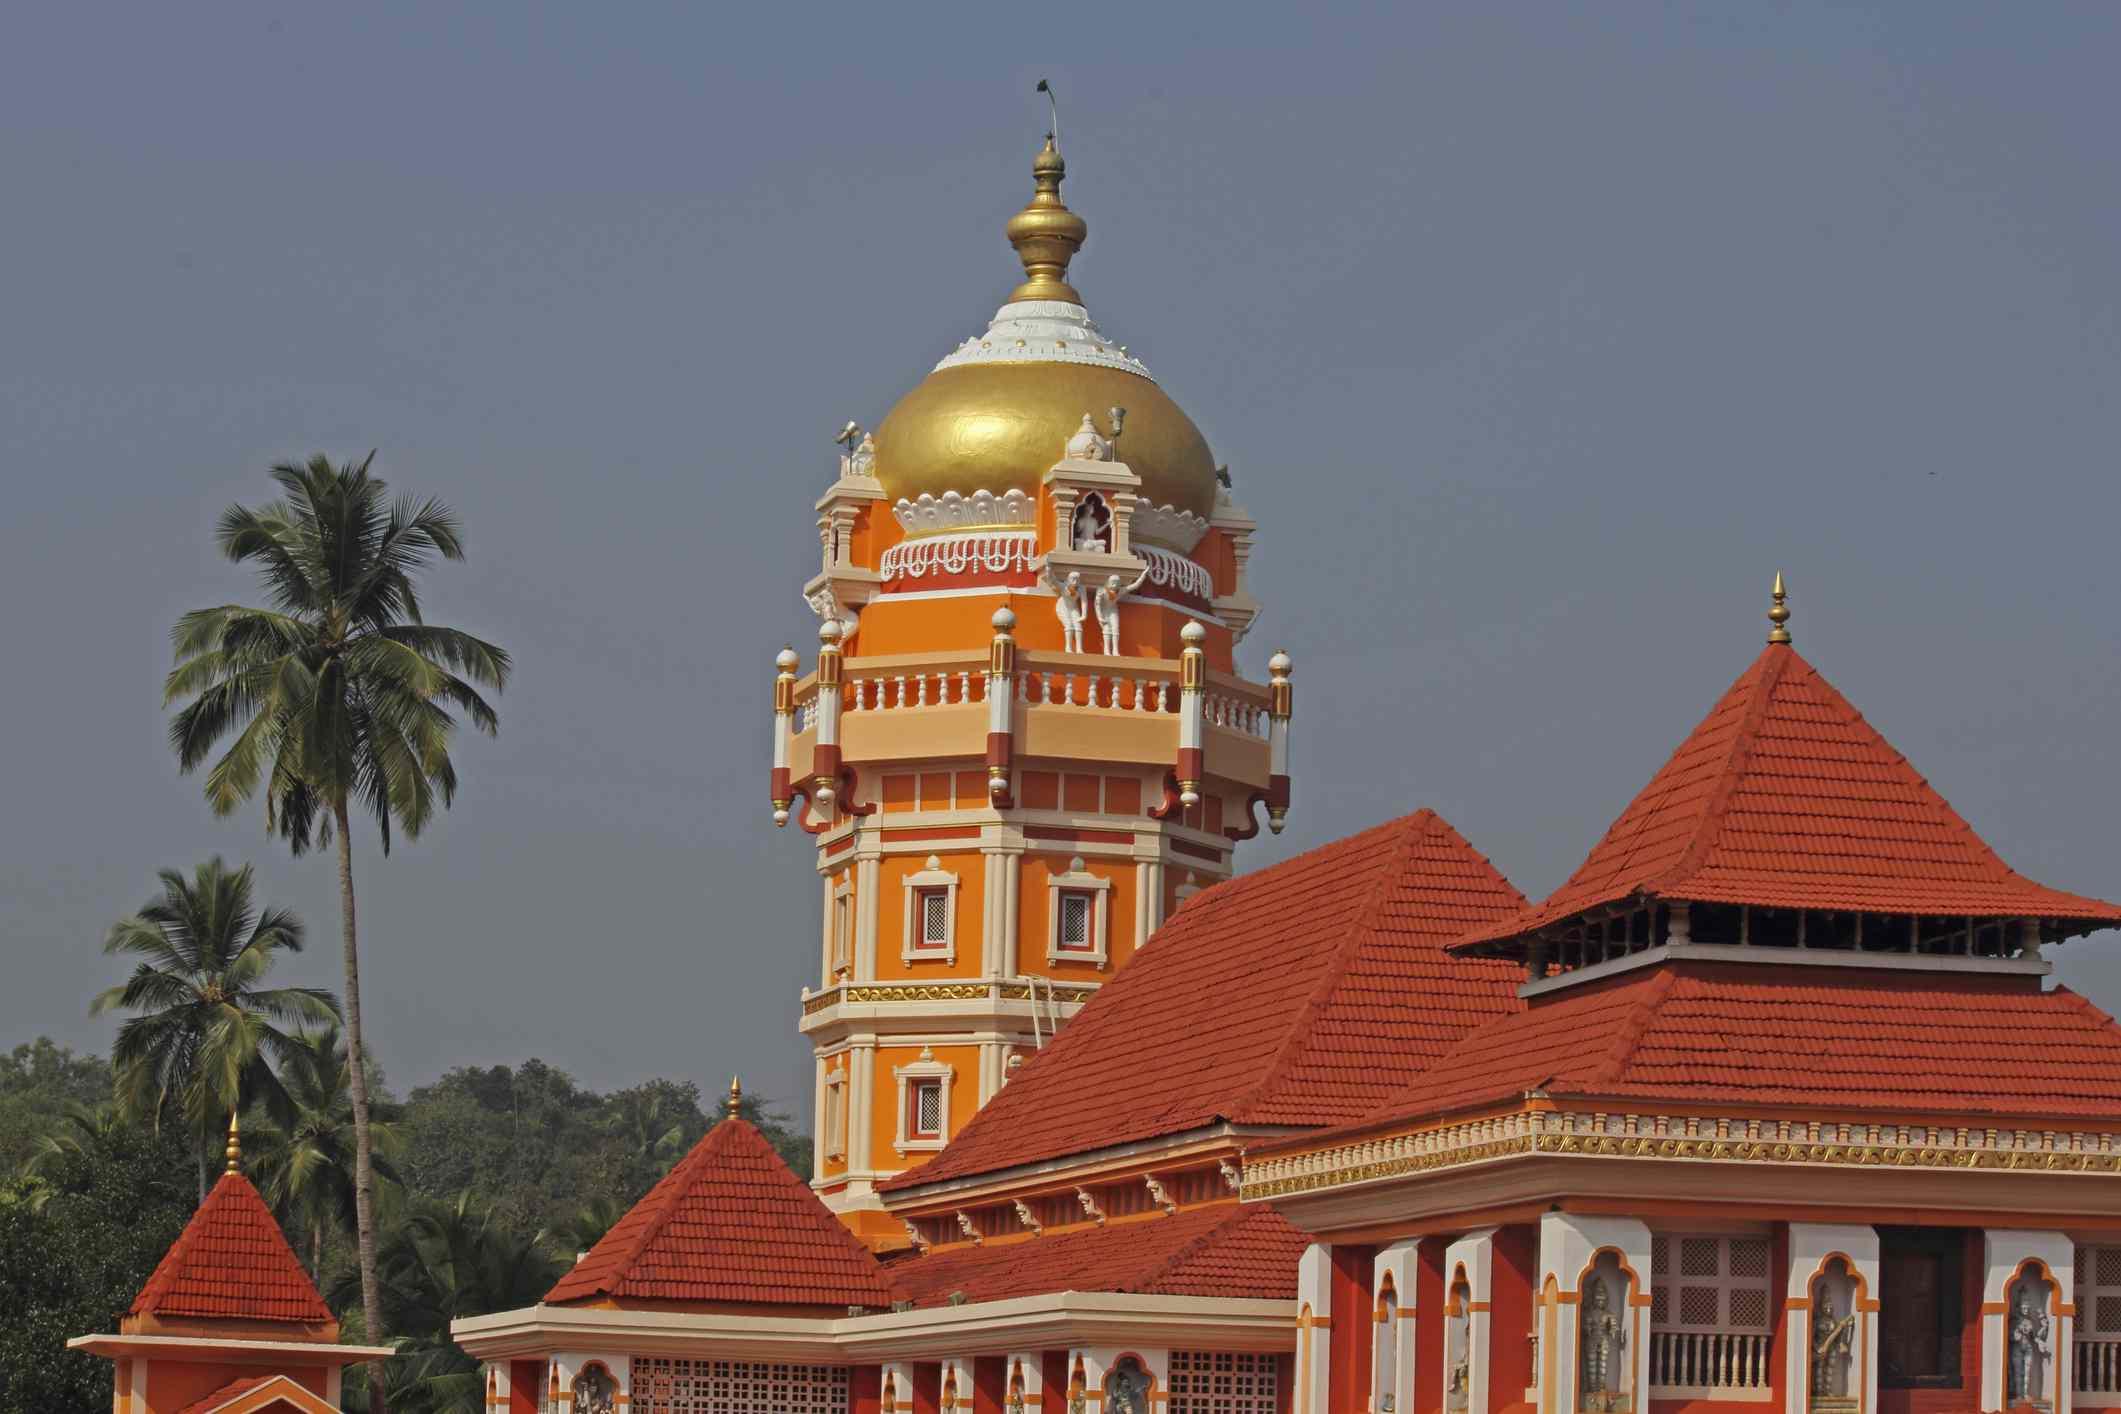 Shri Shantadurga Temple, Kunkallikarin, Fatorpa, Goa